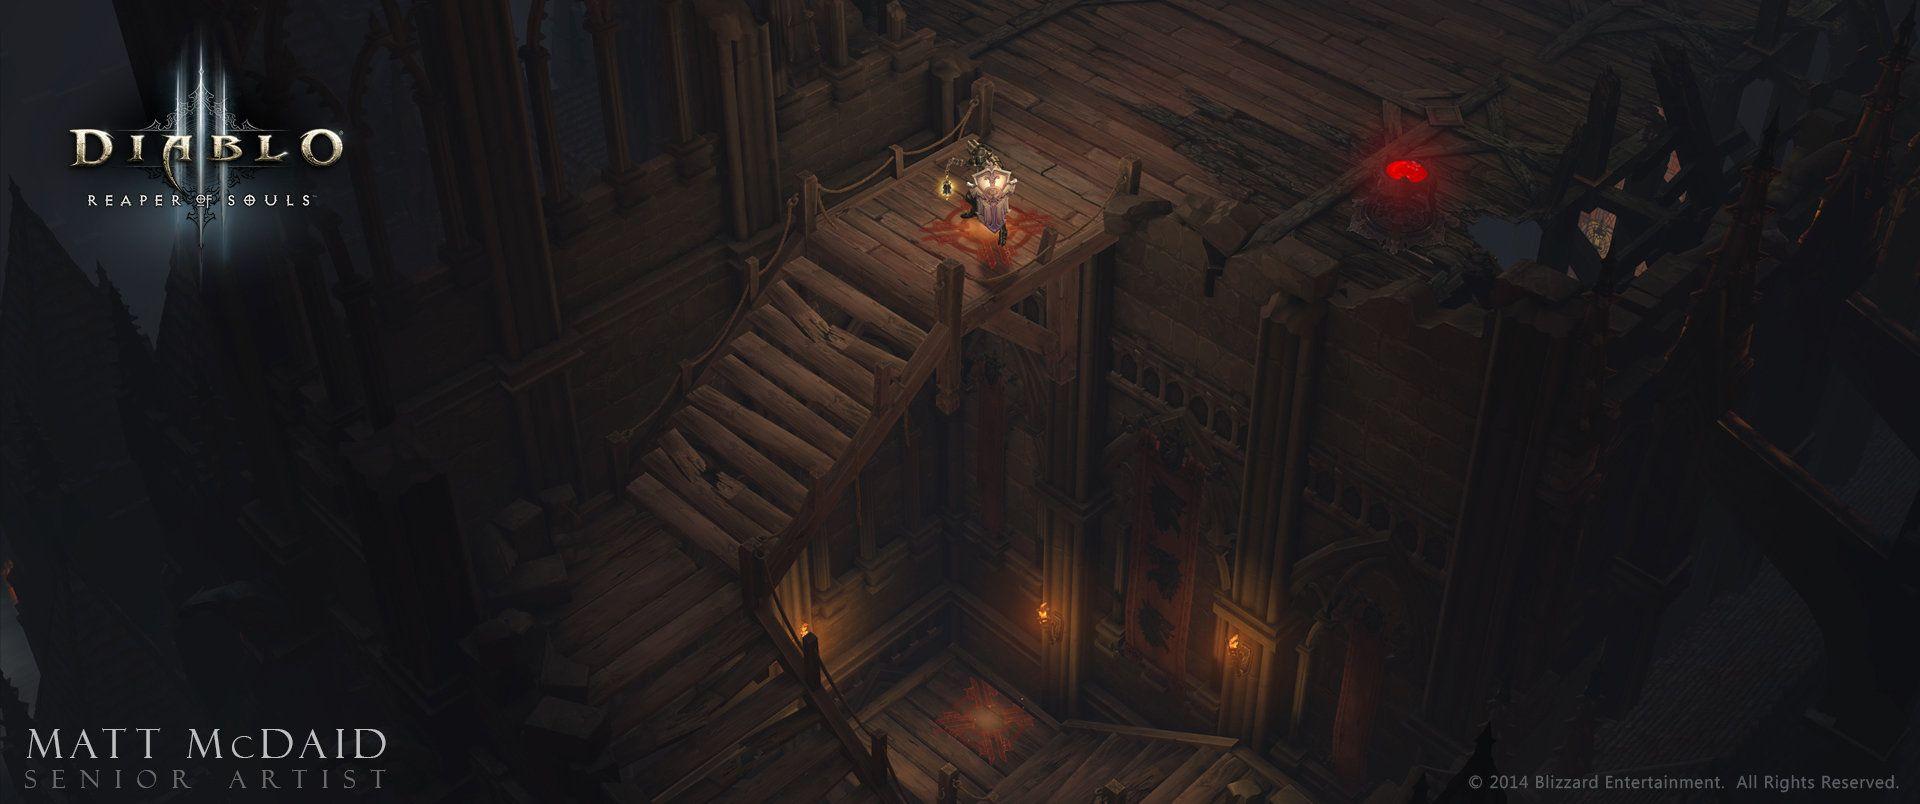 ArtStation - Diablo 3: Reaper of Souls, Matt McDaid